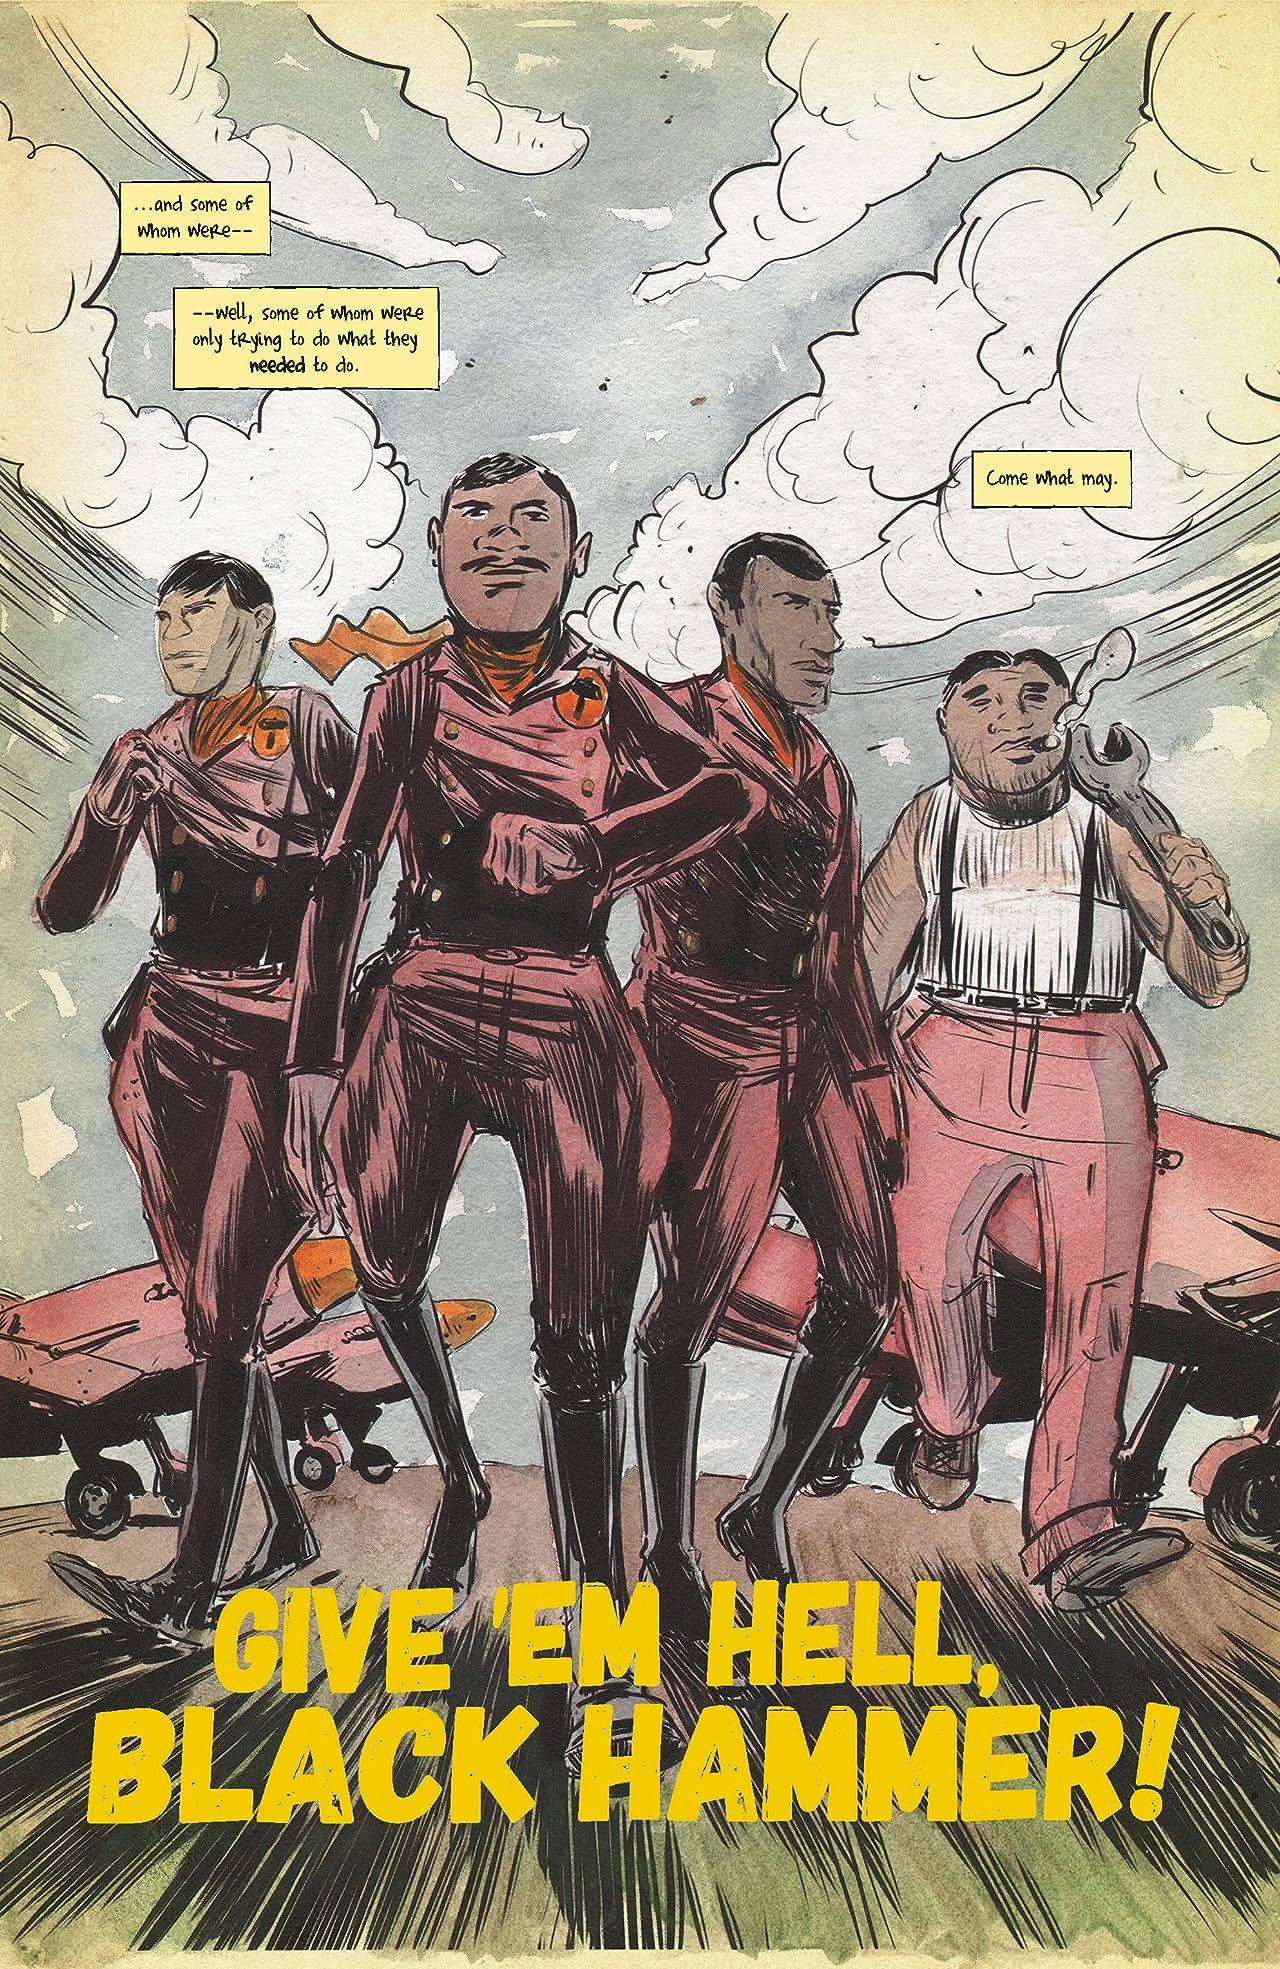 Black Hammer '45: From the World of Black Hammer #4